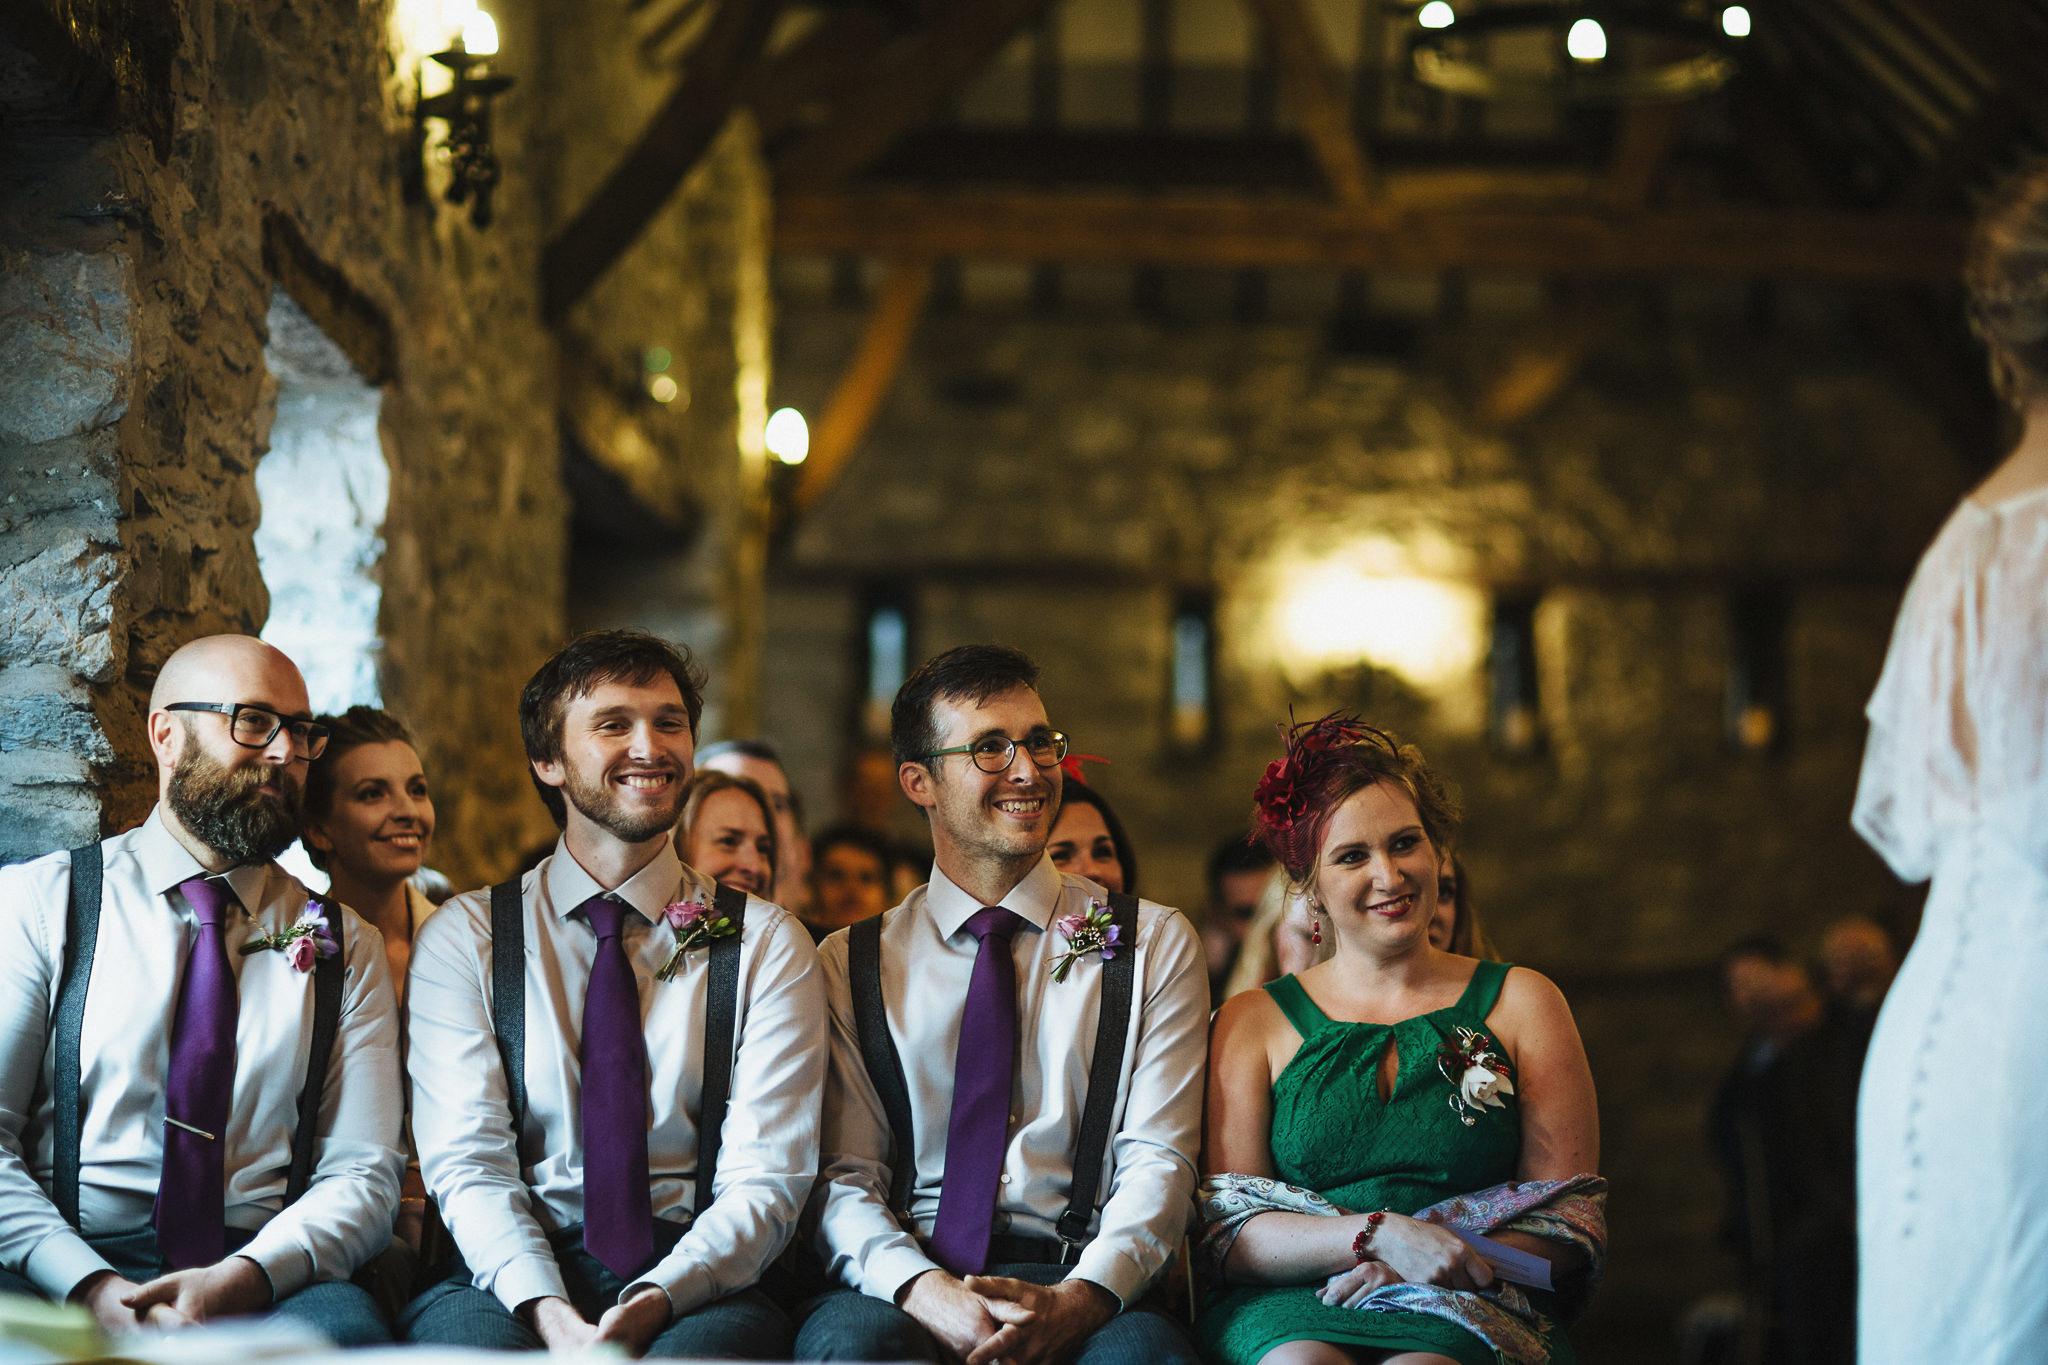 plas-isaf-corwen-north wales wedding-photography-photographer-91026